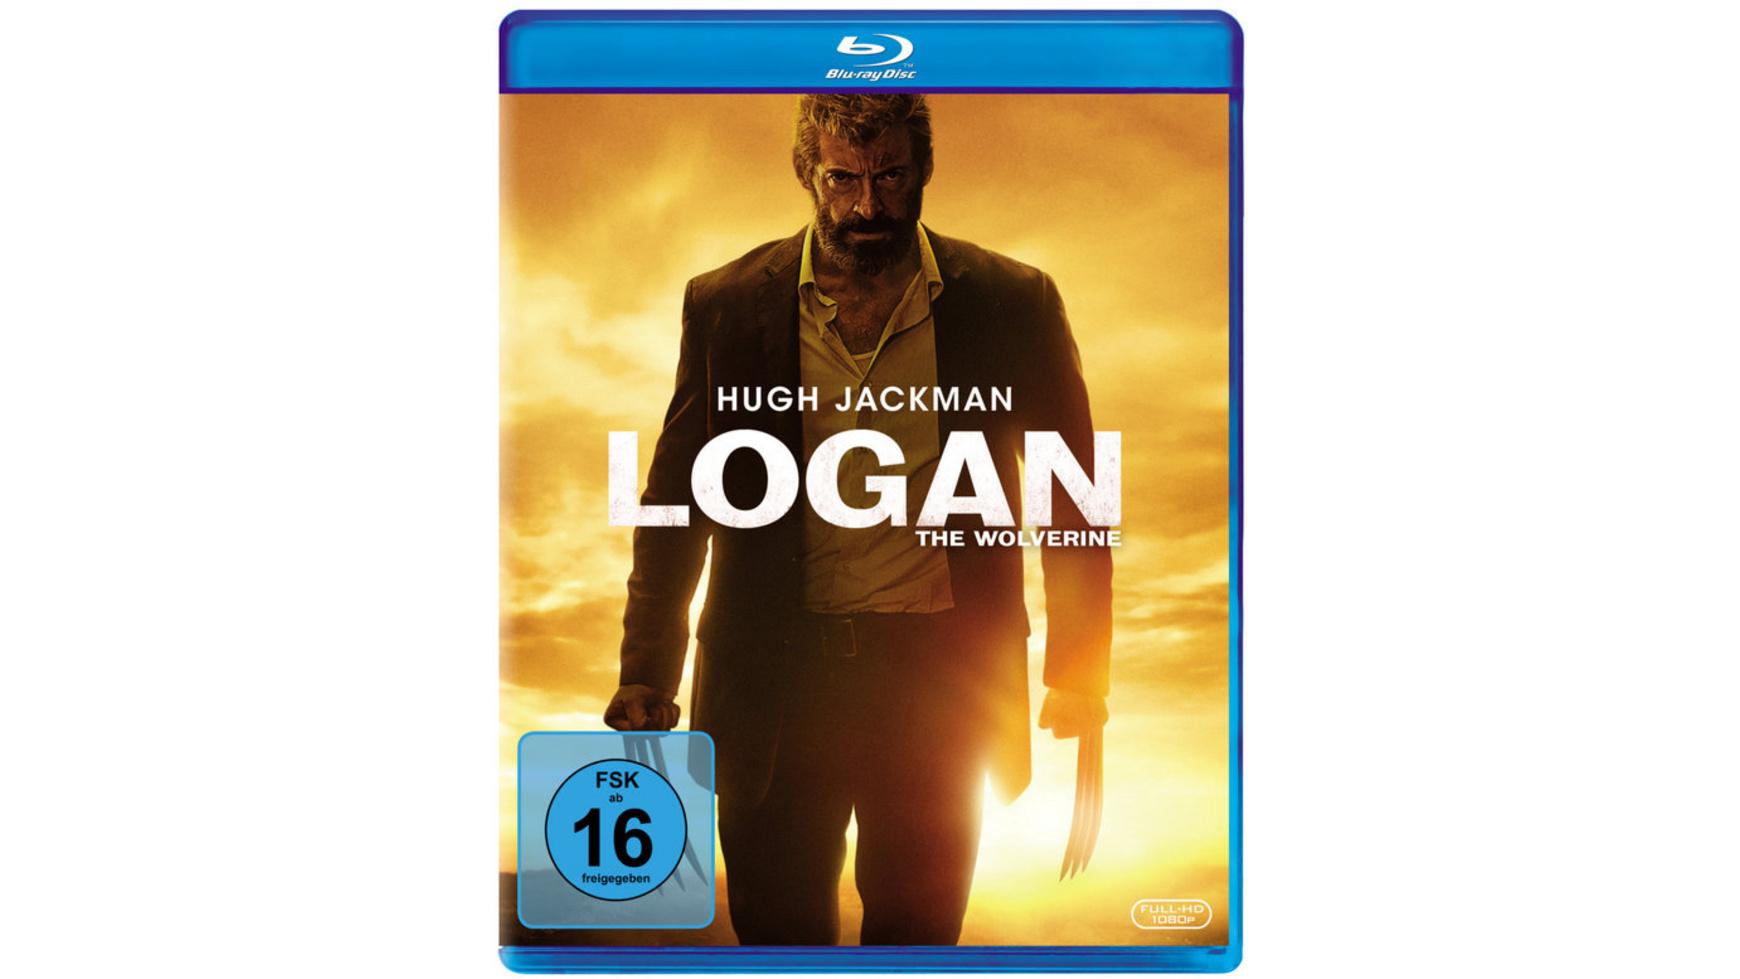 (Müller) 2 Blu-Rays für 15,- EUR Aktion (z.B. Logan, Deadpool, Passengers, Hacksaw Ridge)